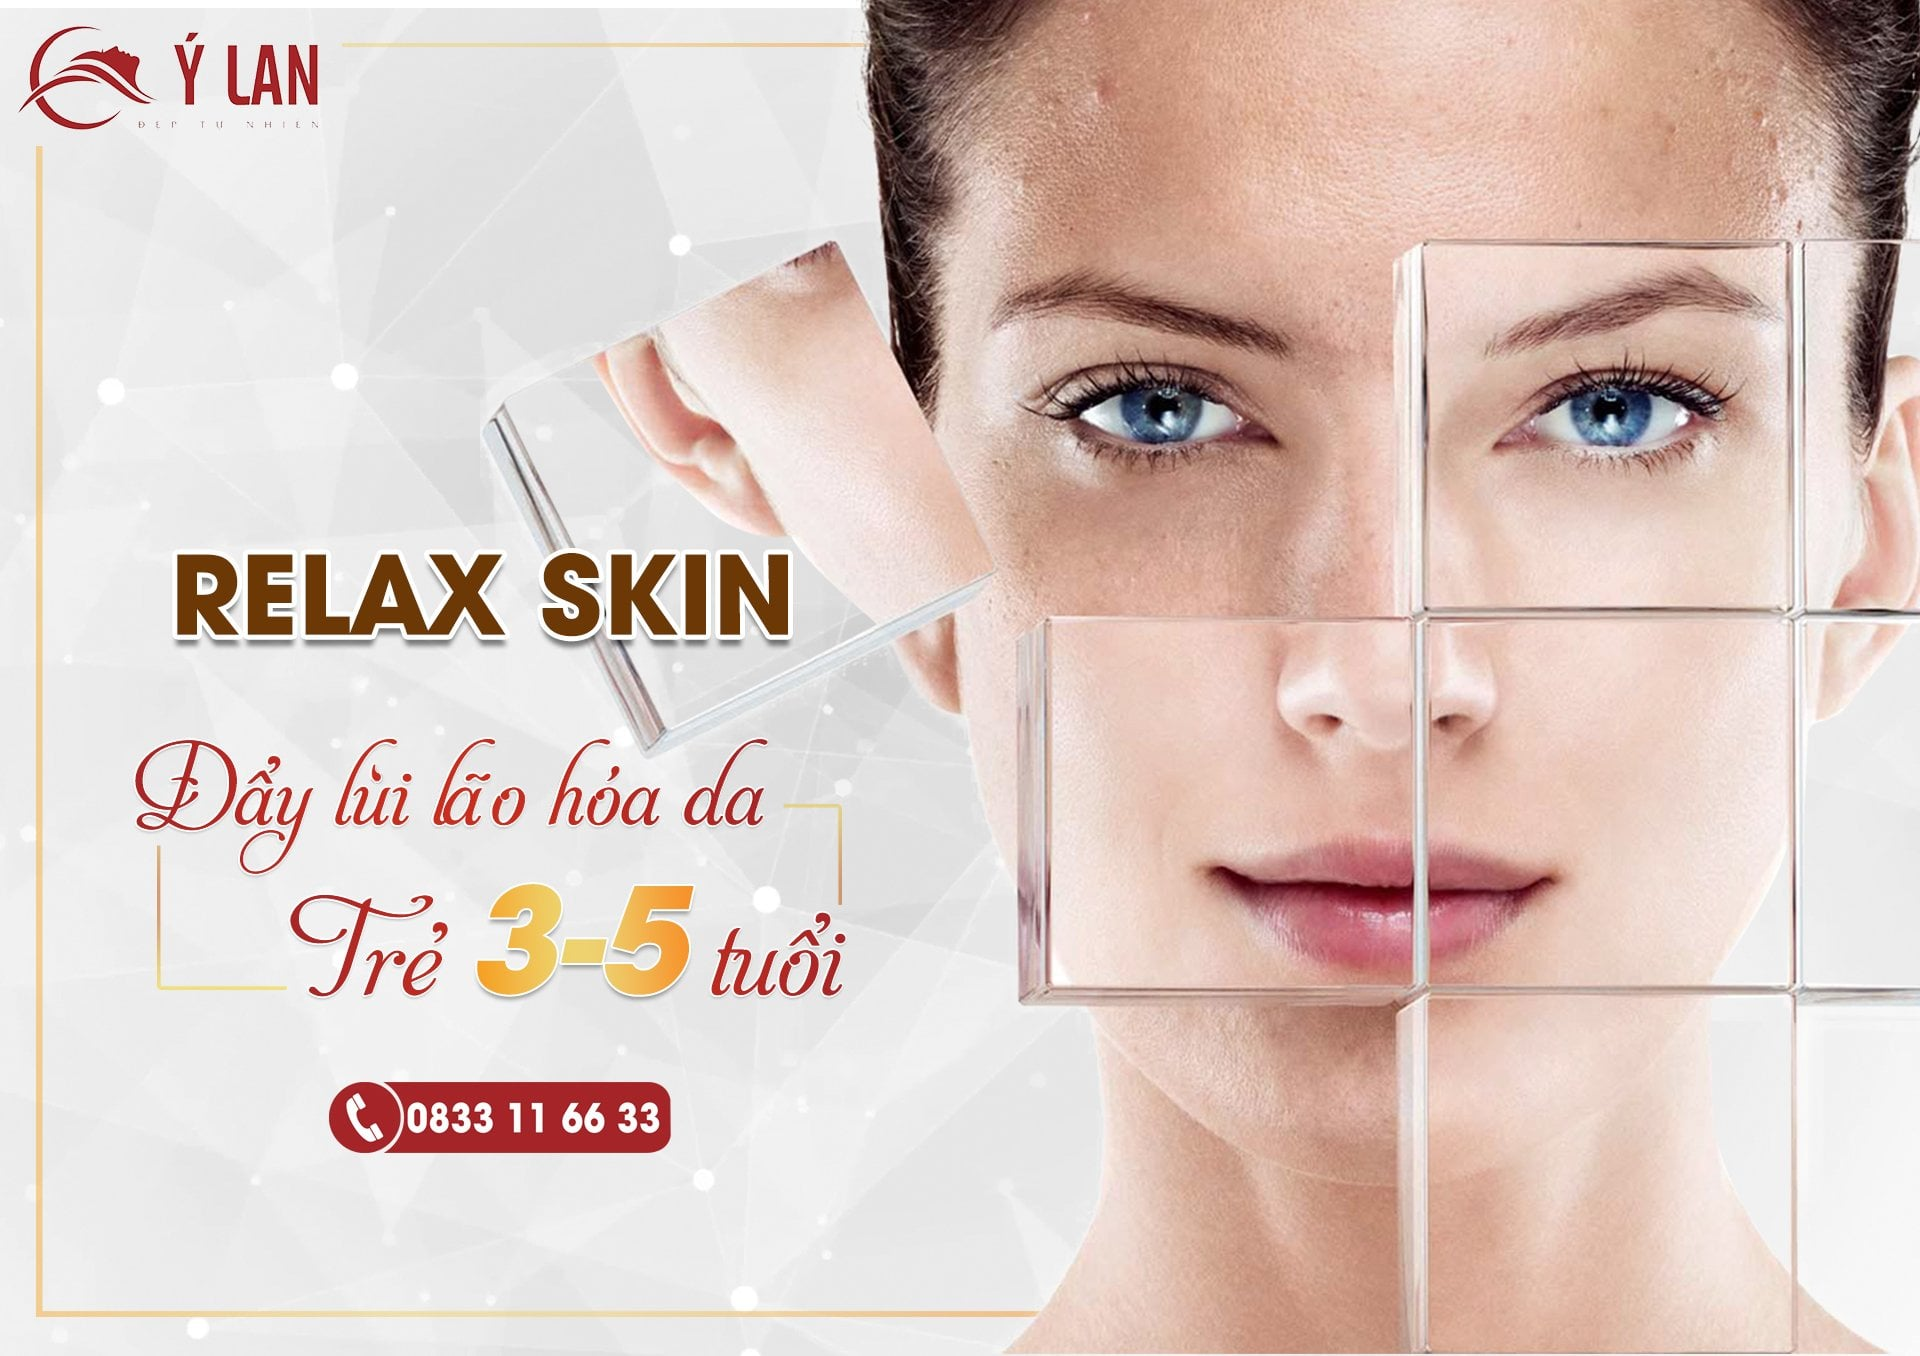 Relax_Skin_-__buoc_dot_pha_manh_me_trong_cuoc_chien_chong_lao_hoa_da_toan_dien